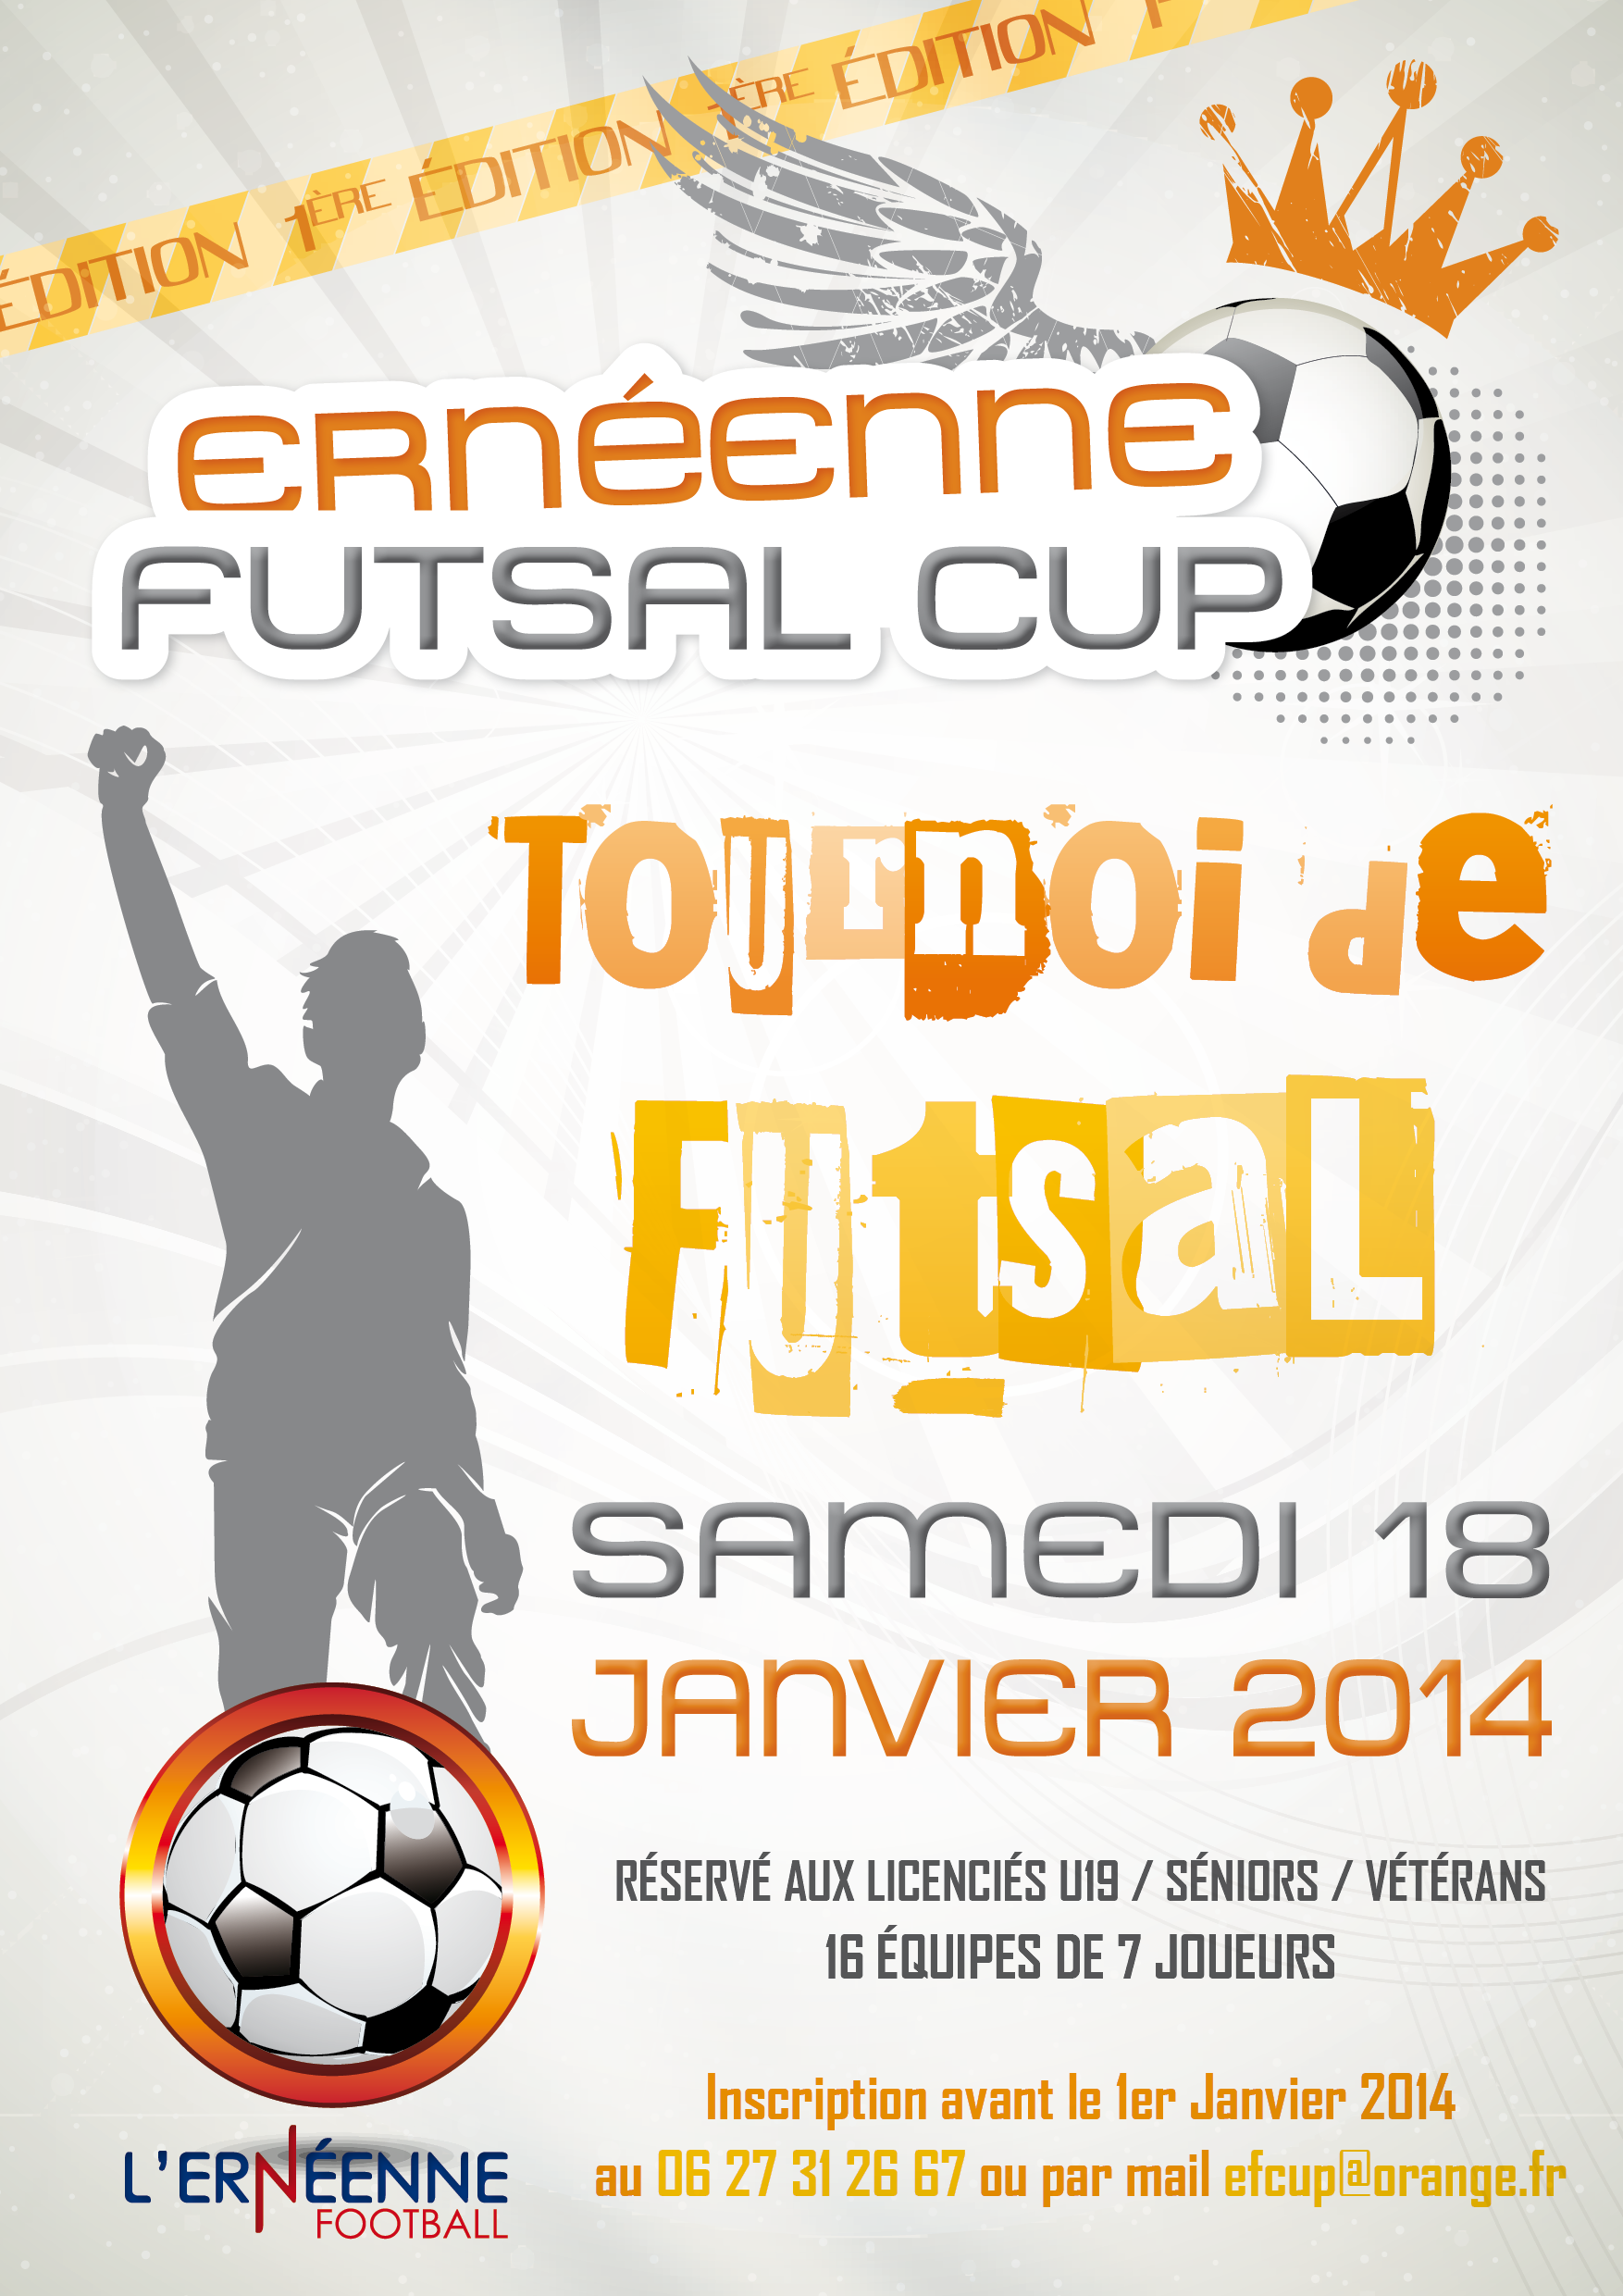 Ernéenne Futsal